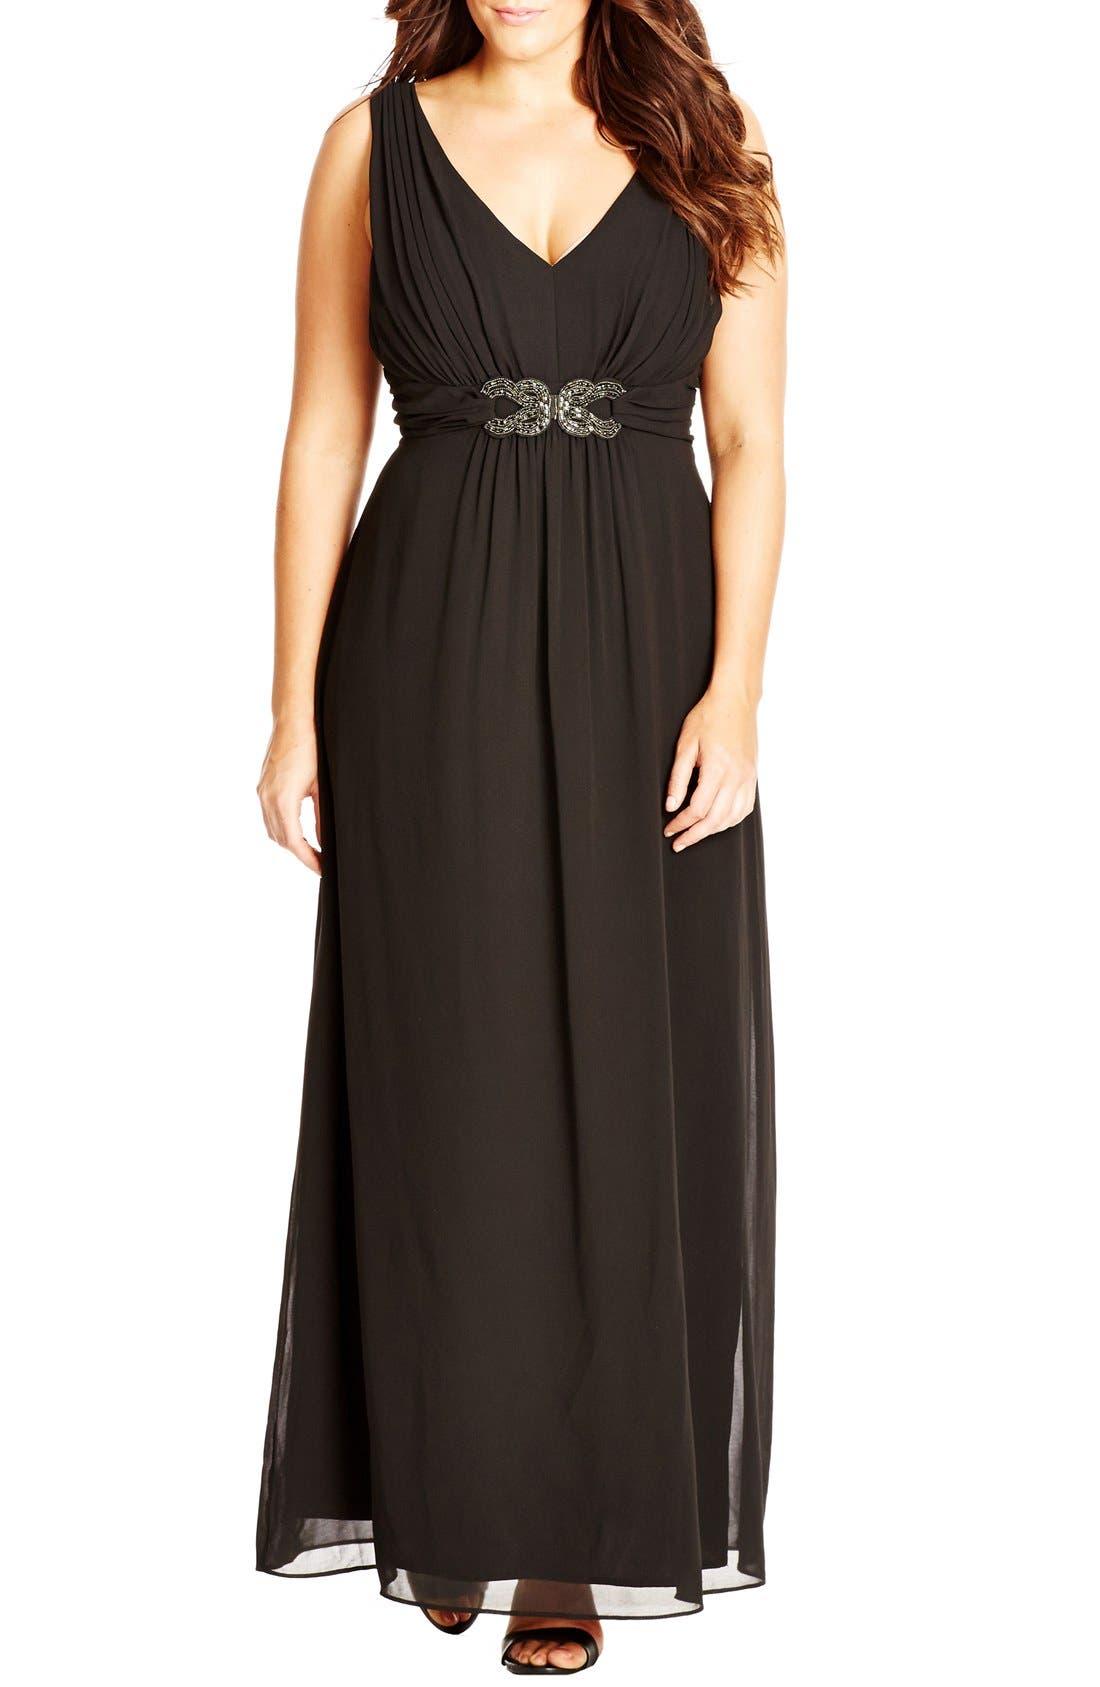 'Elegant Sparkle' Embellished Maxi Dress,                             Main thumbnail 1, color,                             Black